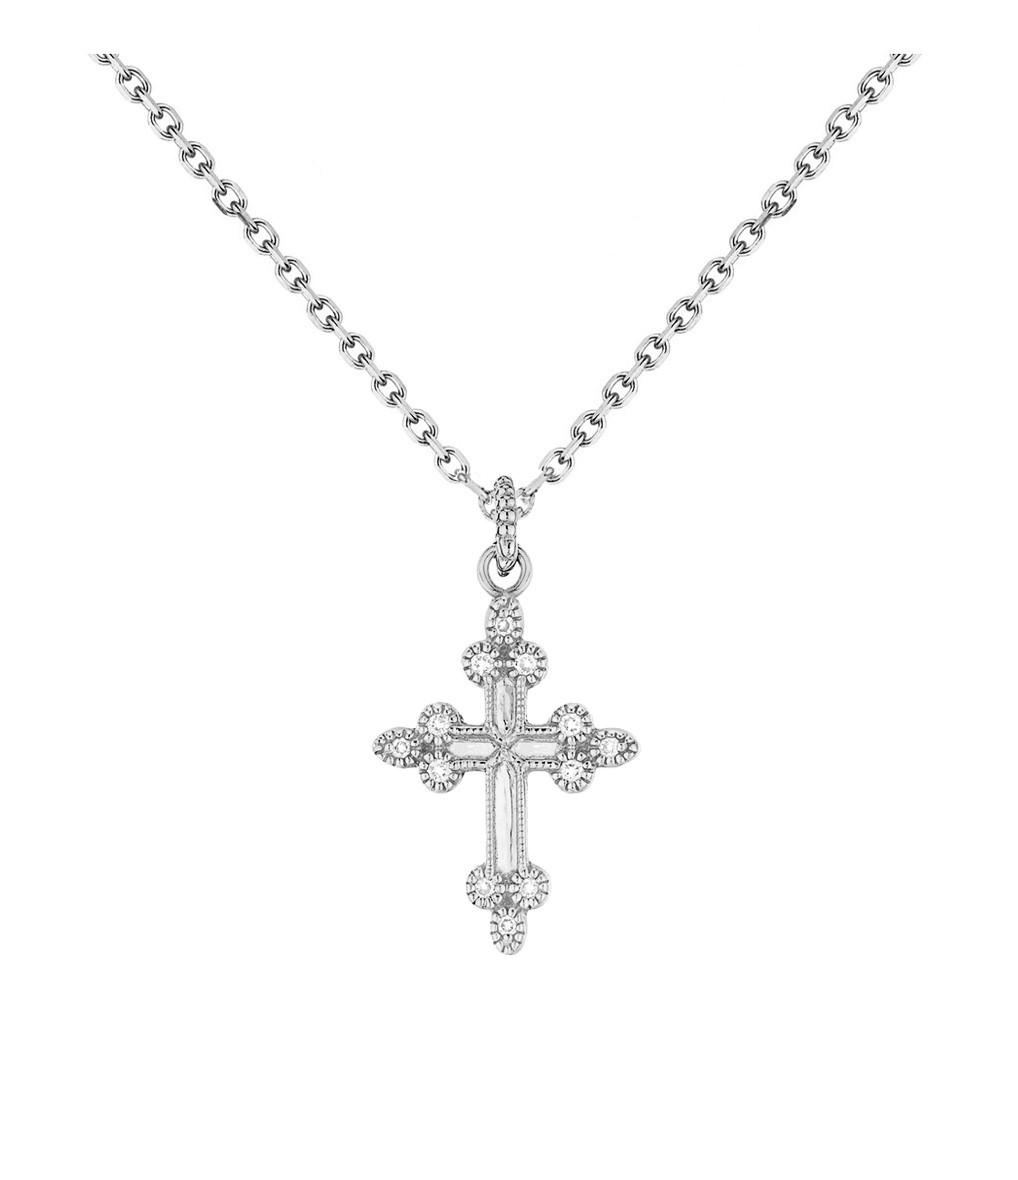 Collier Devotion Or Diamants - Stone